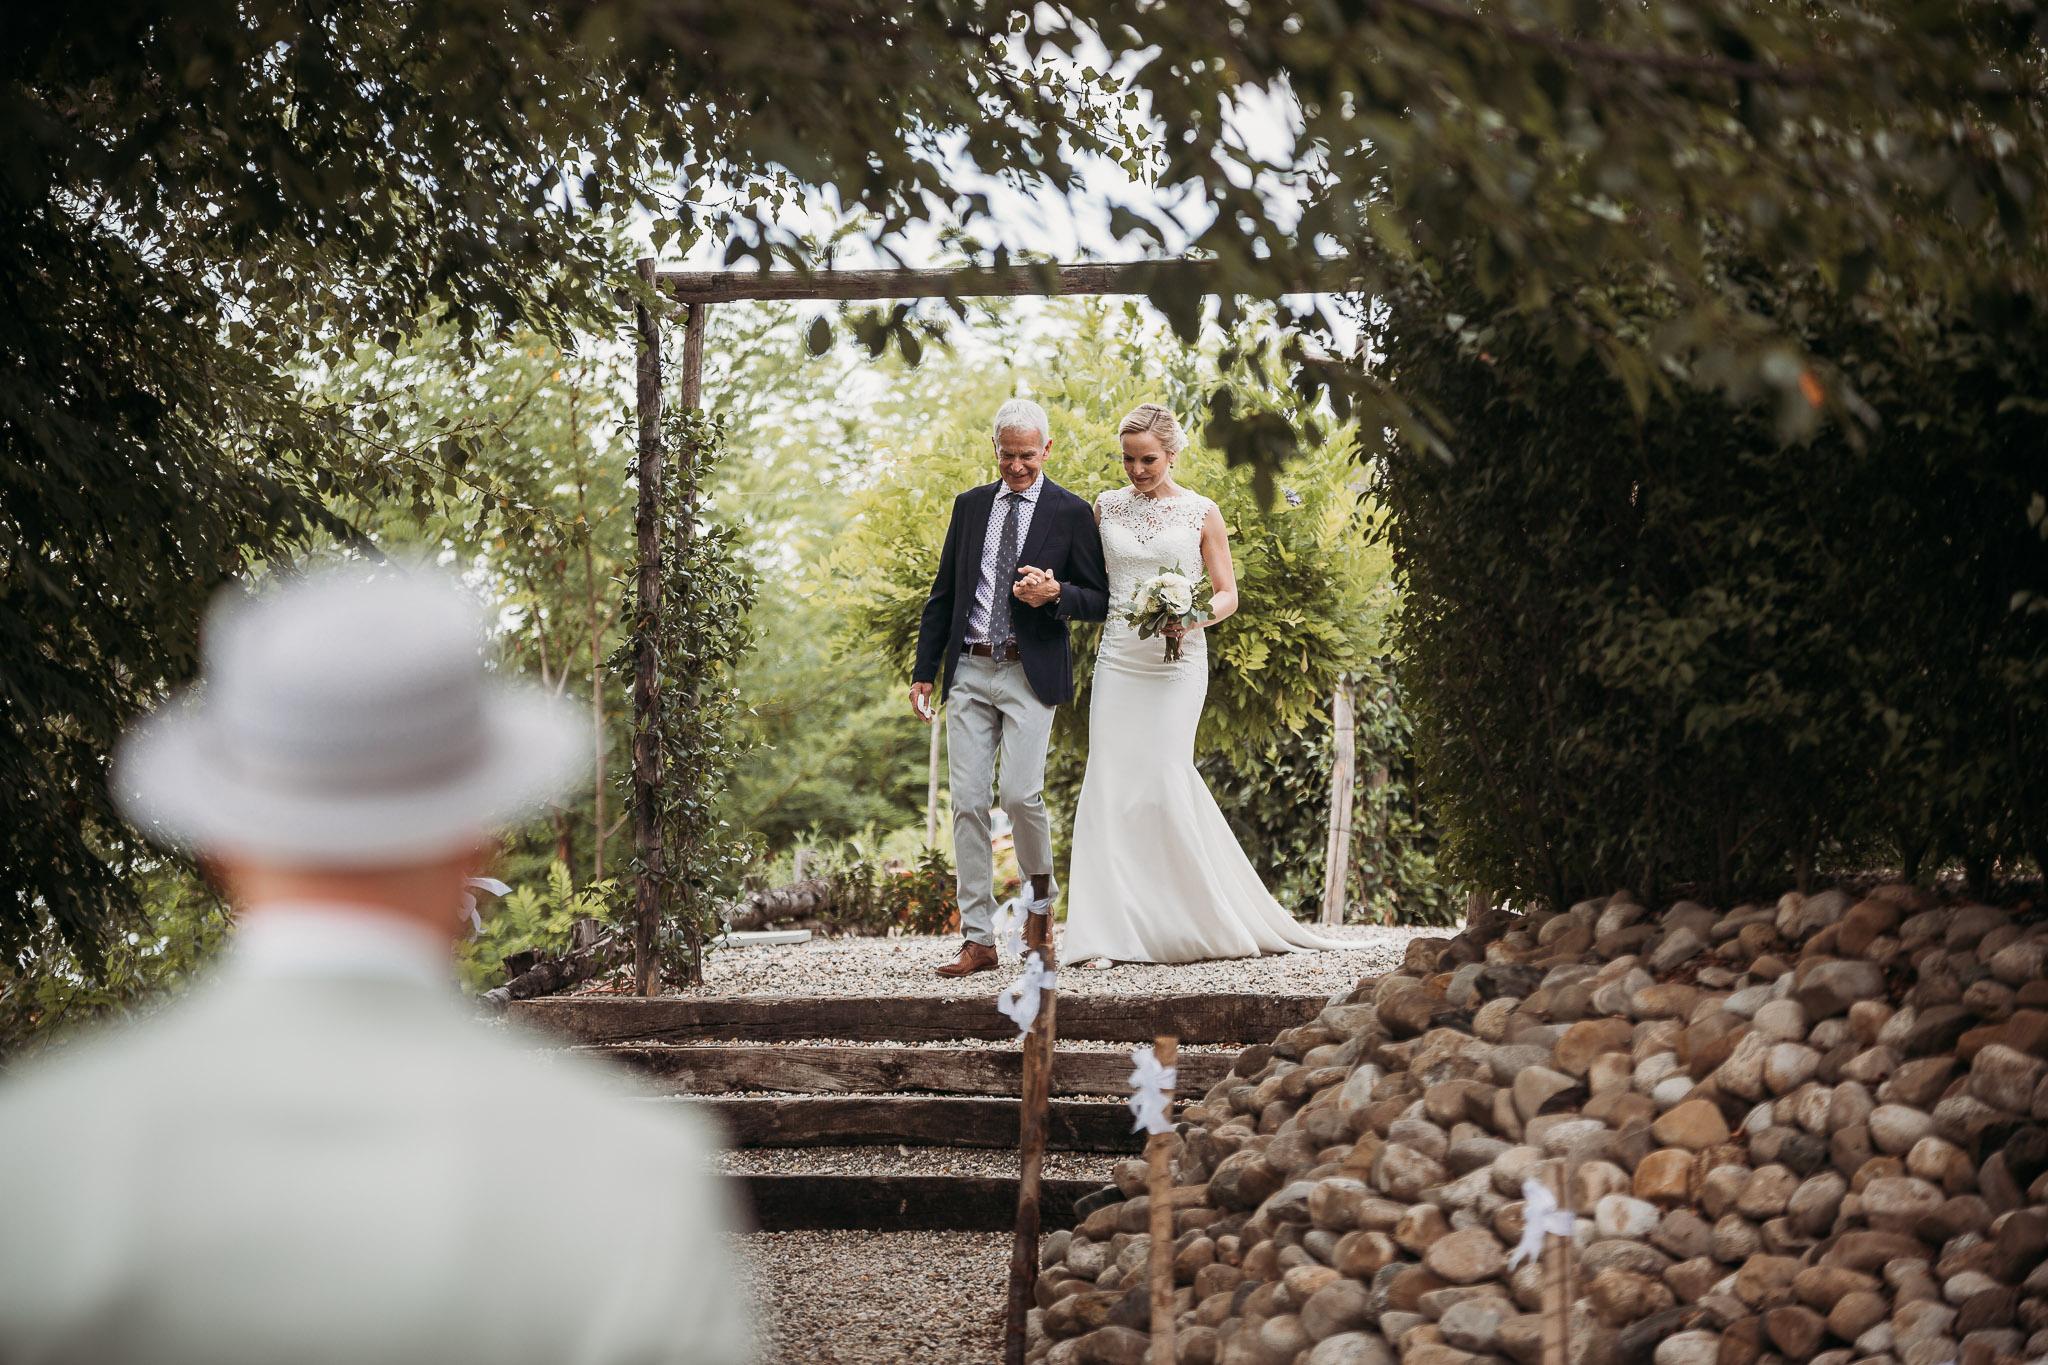 The bride arrives atthe wedding ceremony terrace on the countryside at La Villa Hotel, Mombaruzzo